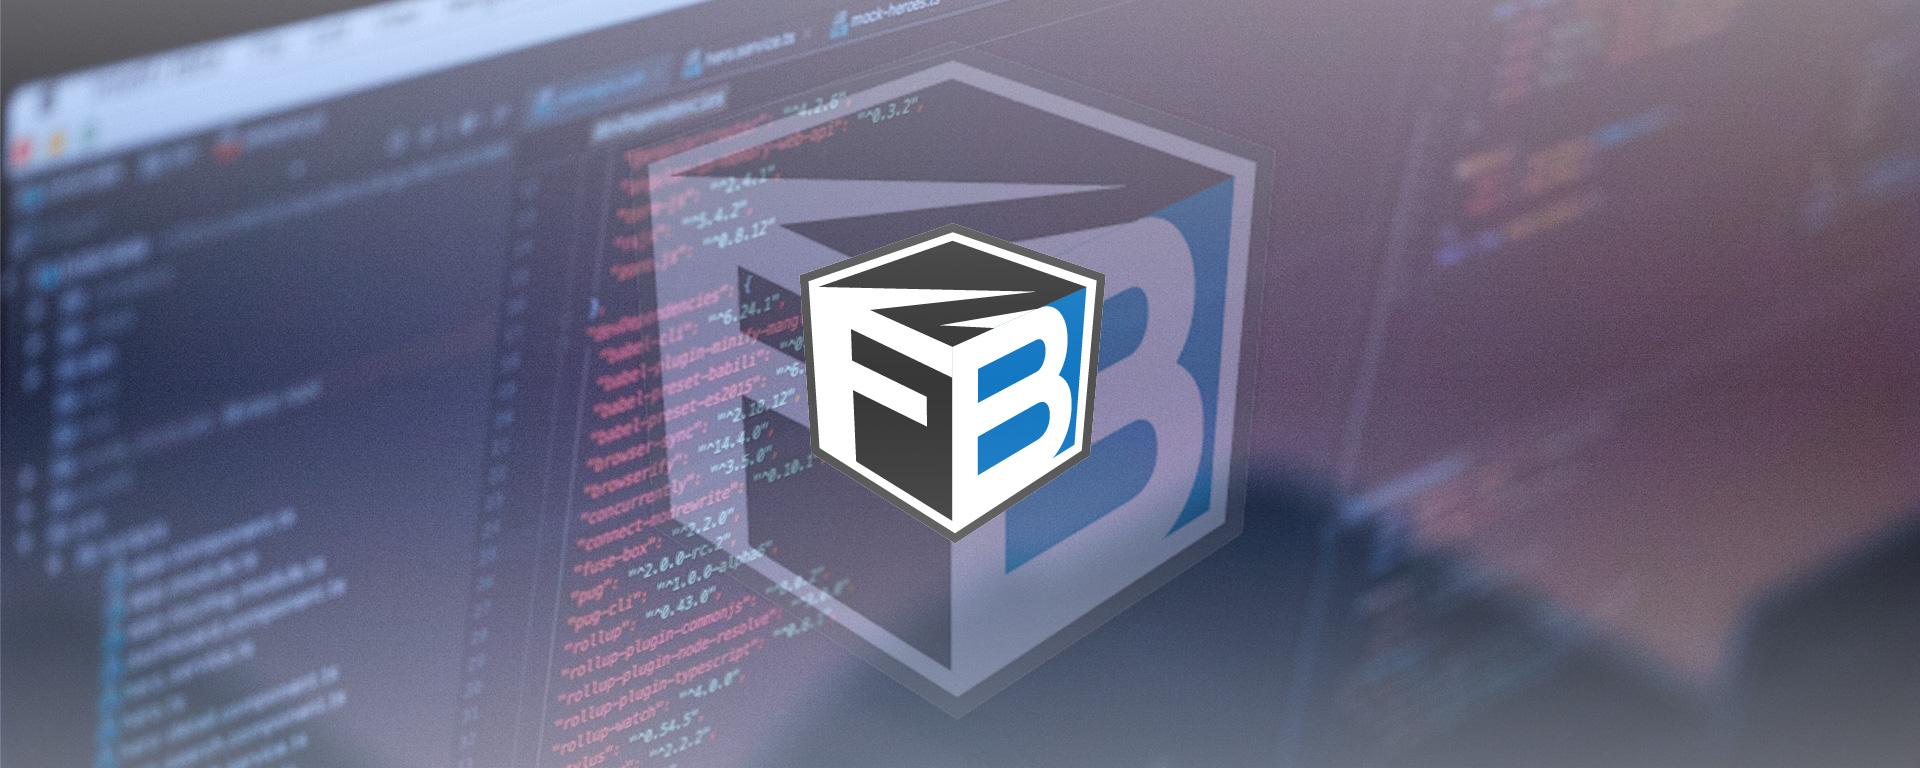 FuseBox - 新進気鋭の JavaScript モジュールバンドラー